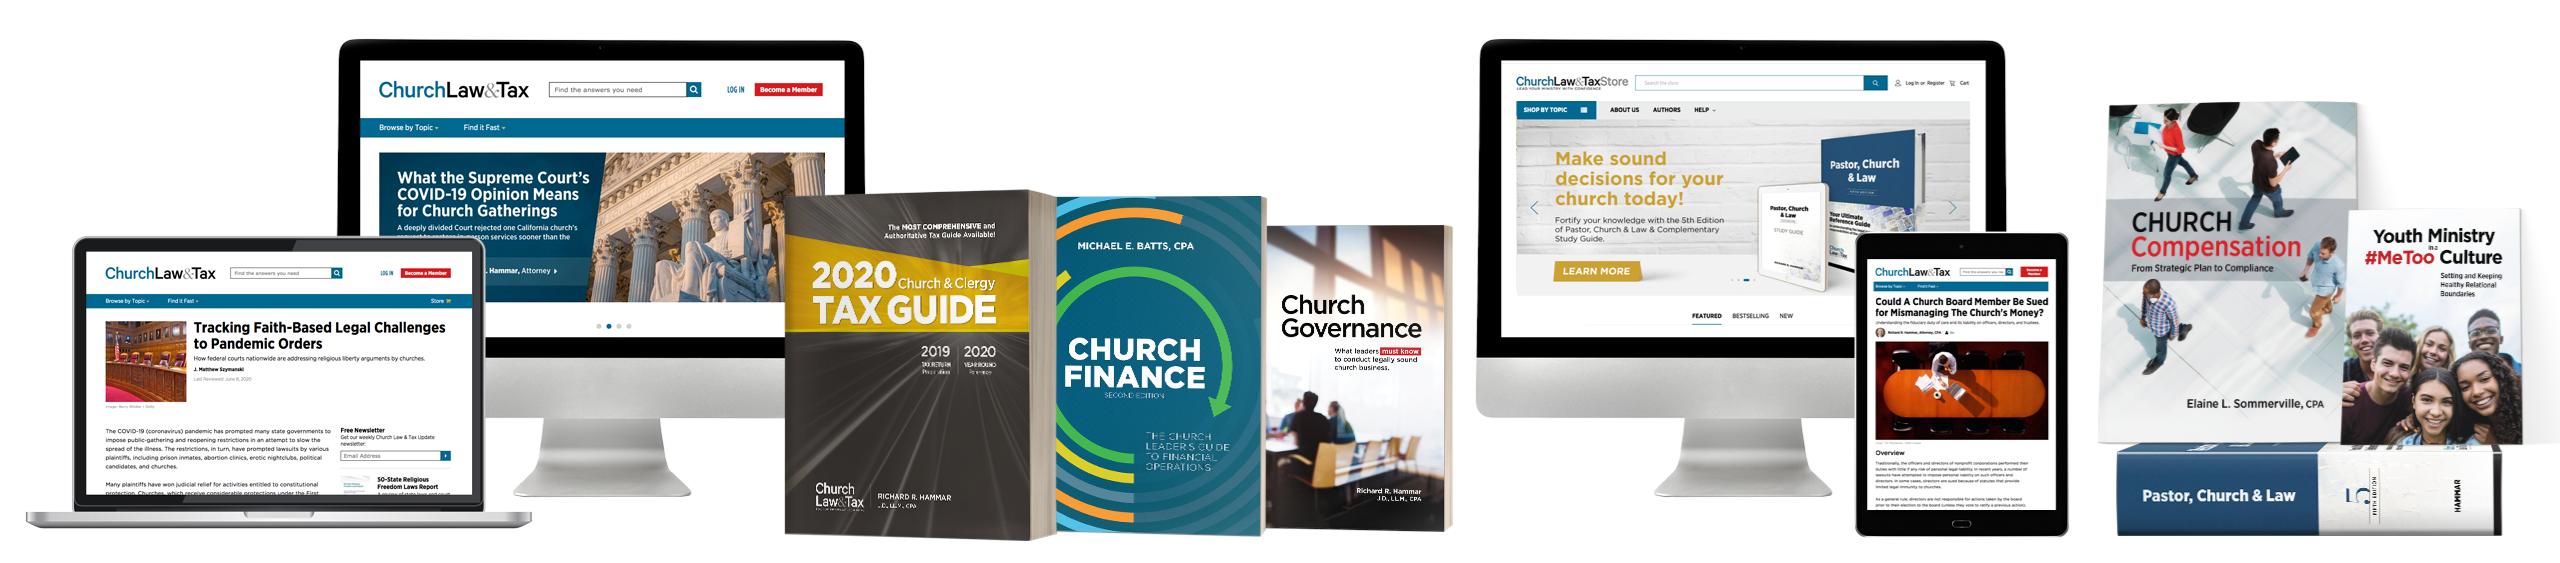 Church Law & Tax